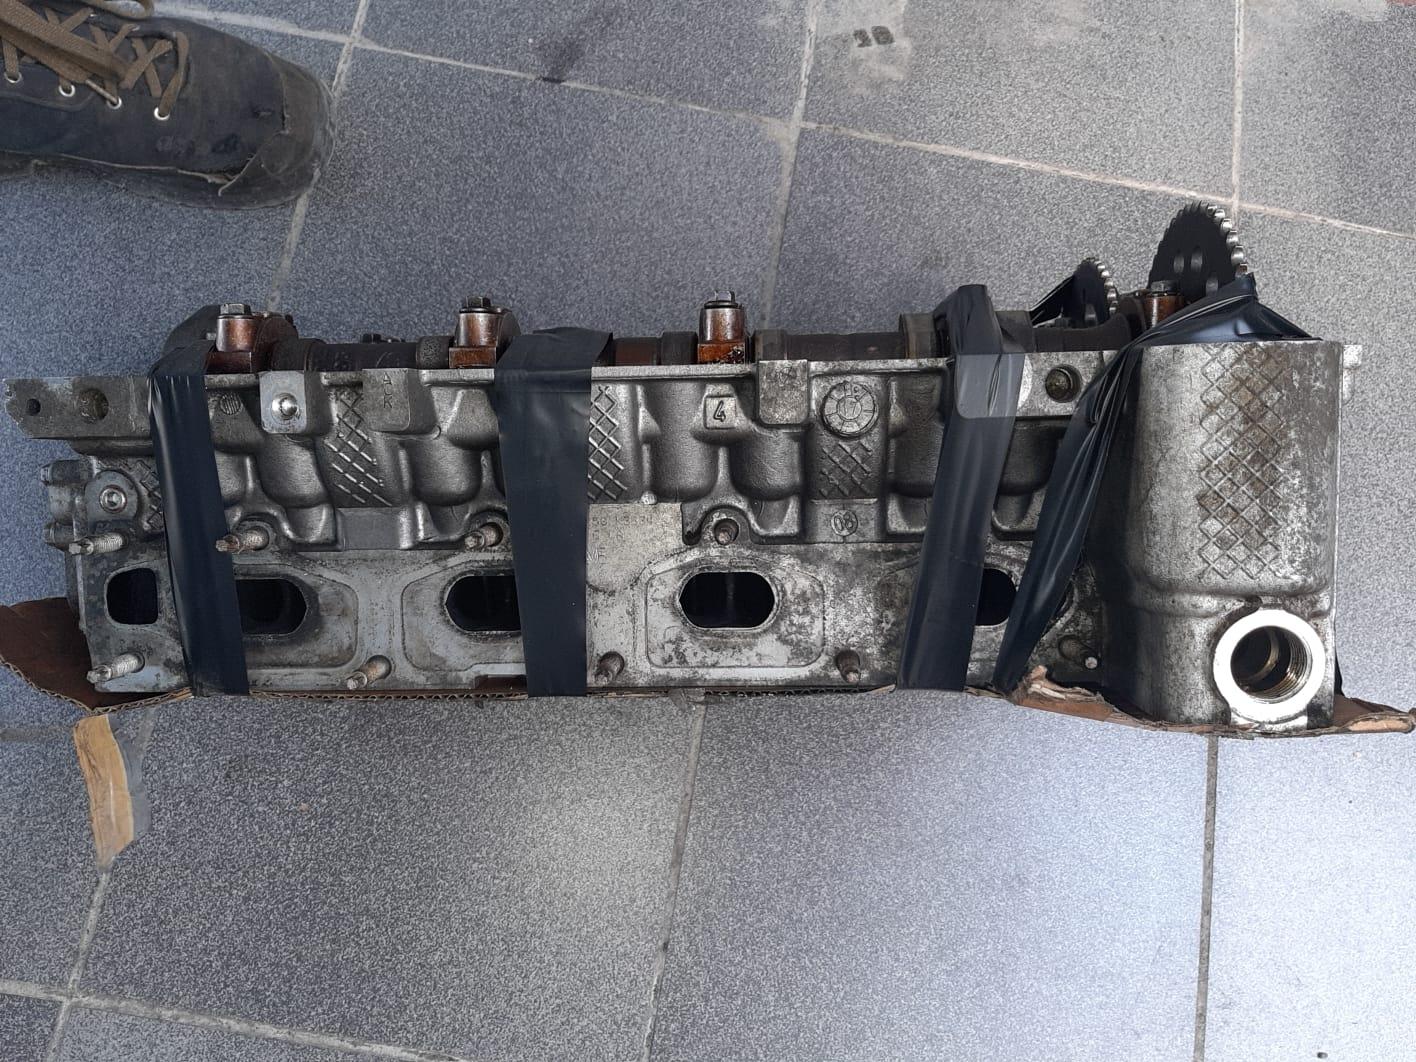 Zrobiona Głowica Opel Vectra C 2.2 16V 55561003